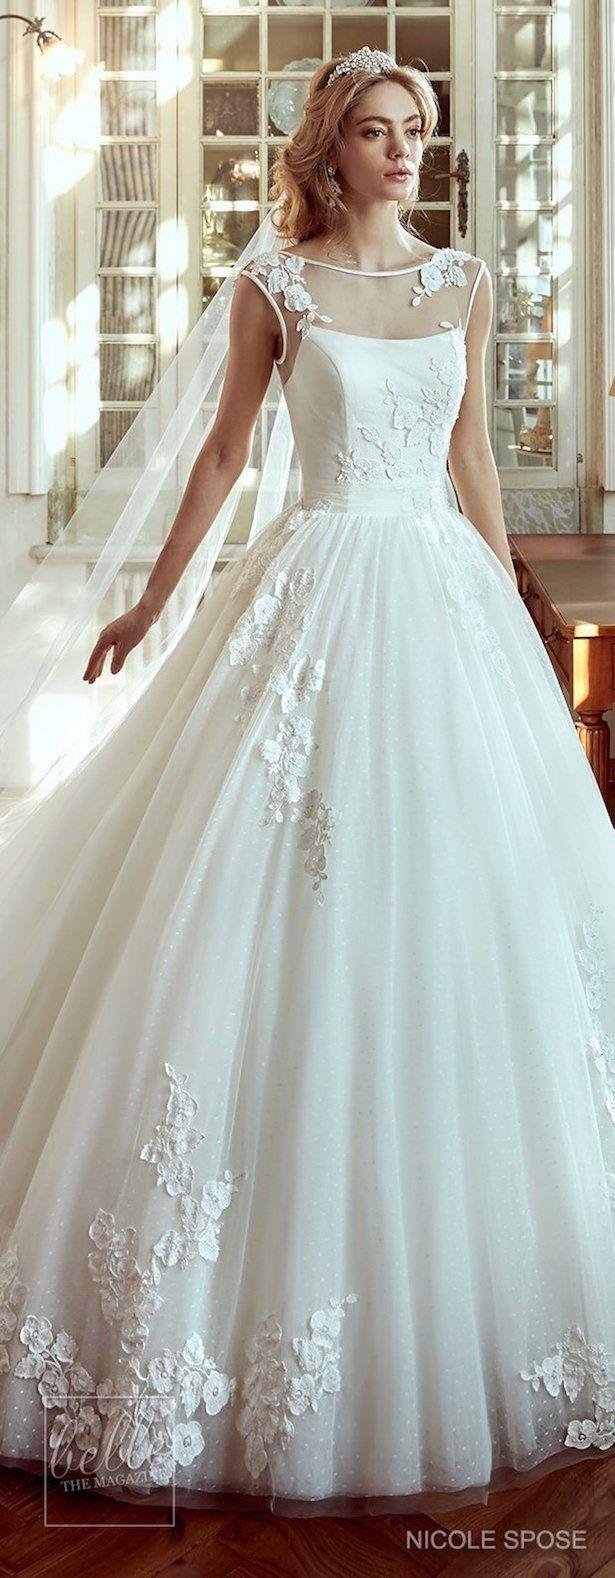 177 best Wedding Dress images on Pinterest   Short wedding gowns ...